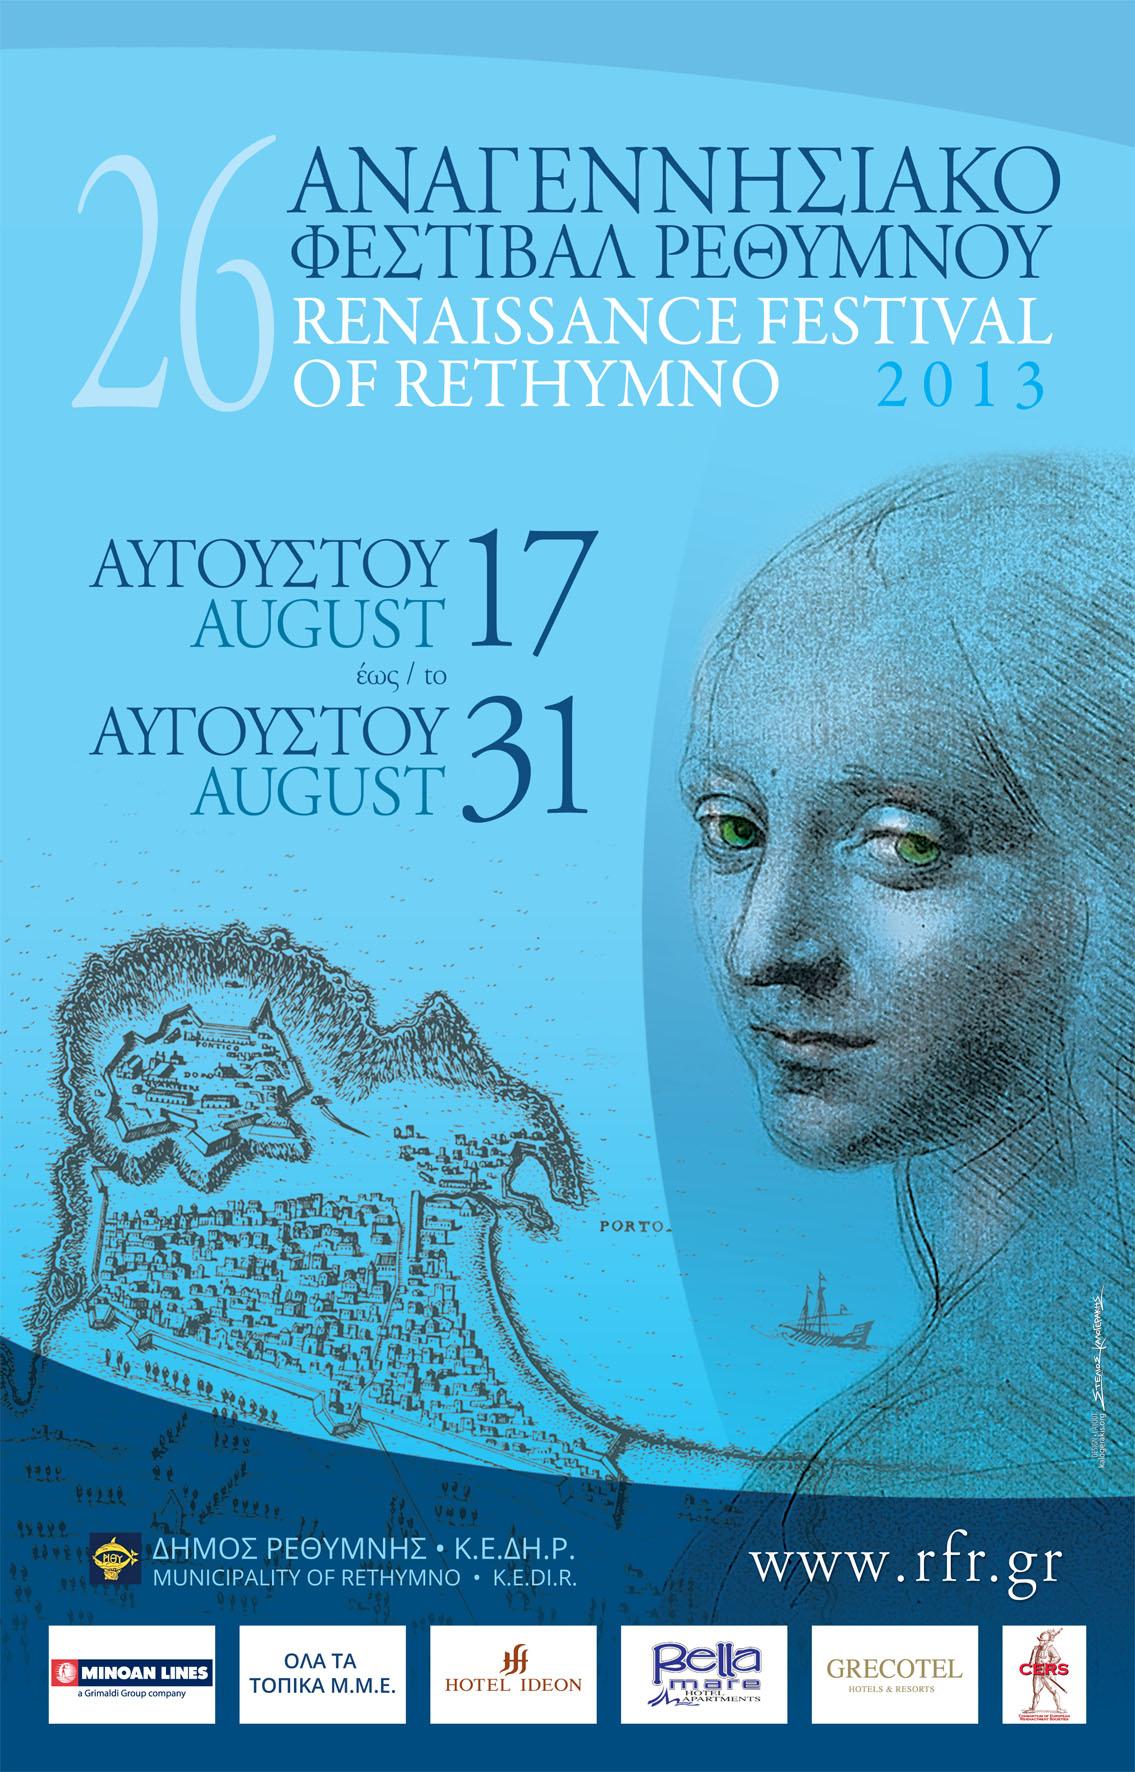 26th Rethymno Renaissance Festival